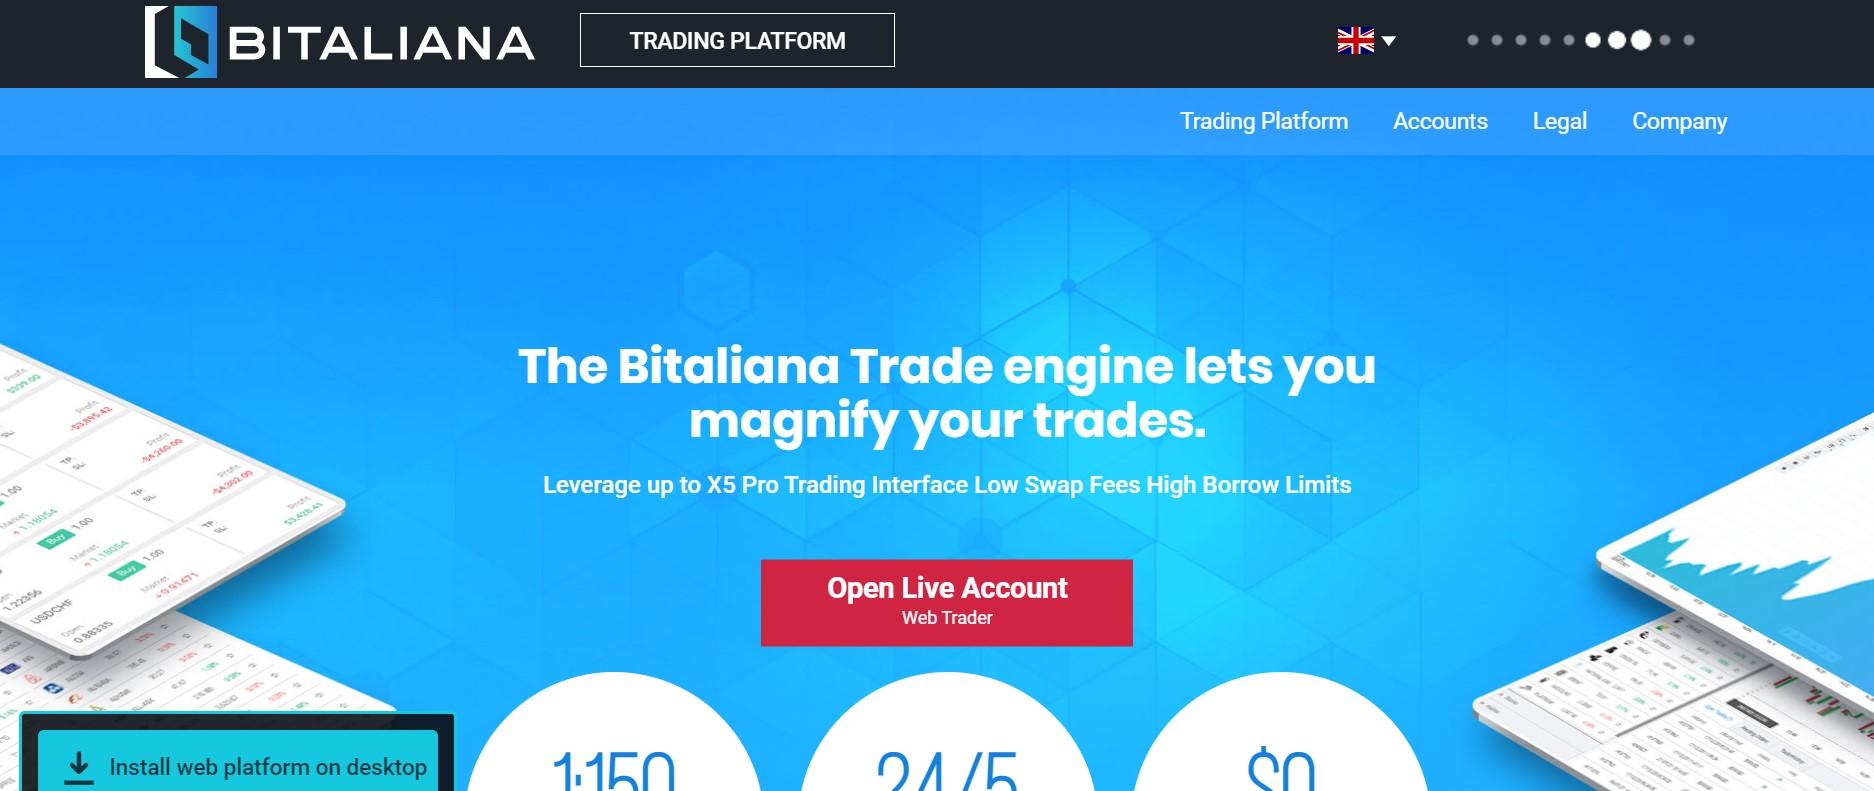 Bitaliana website